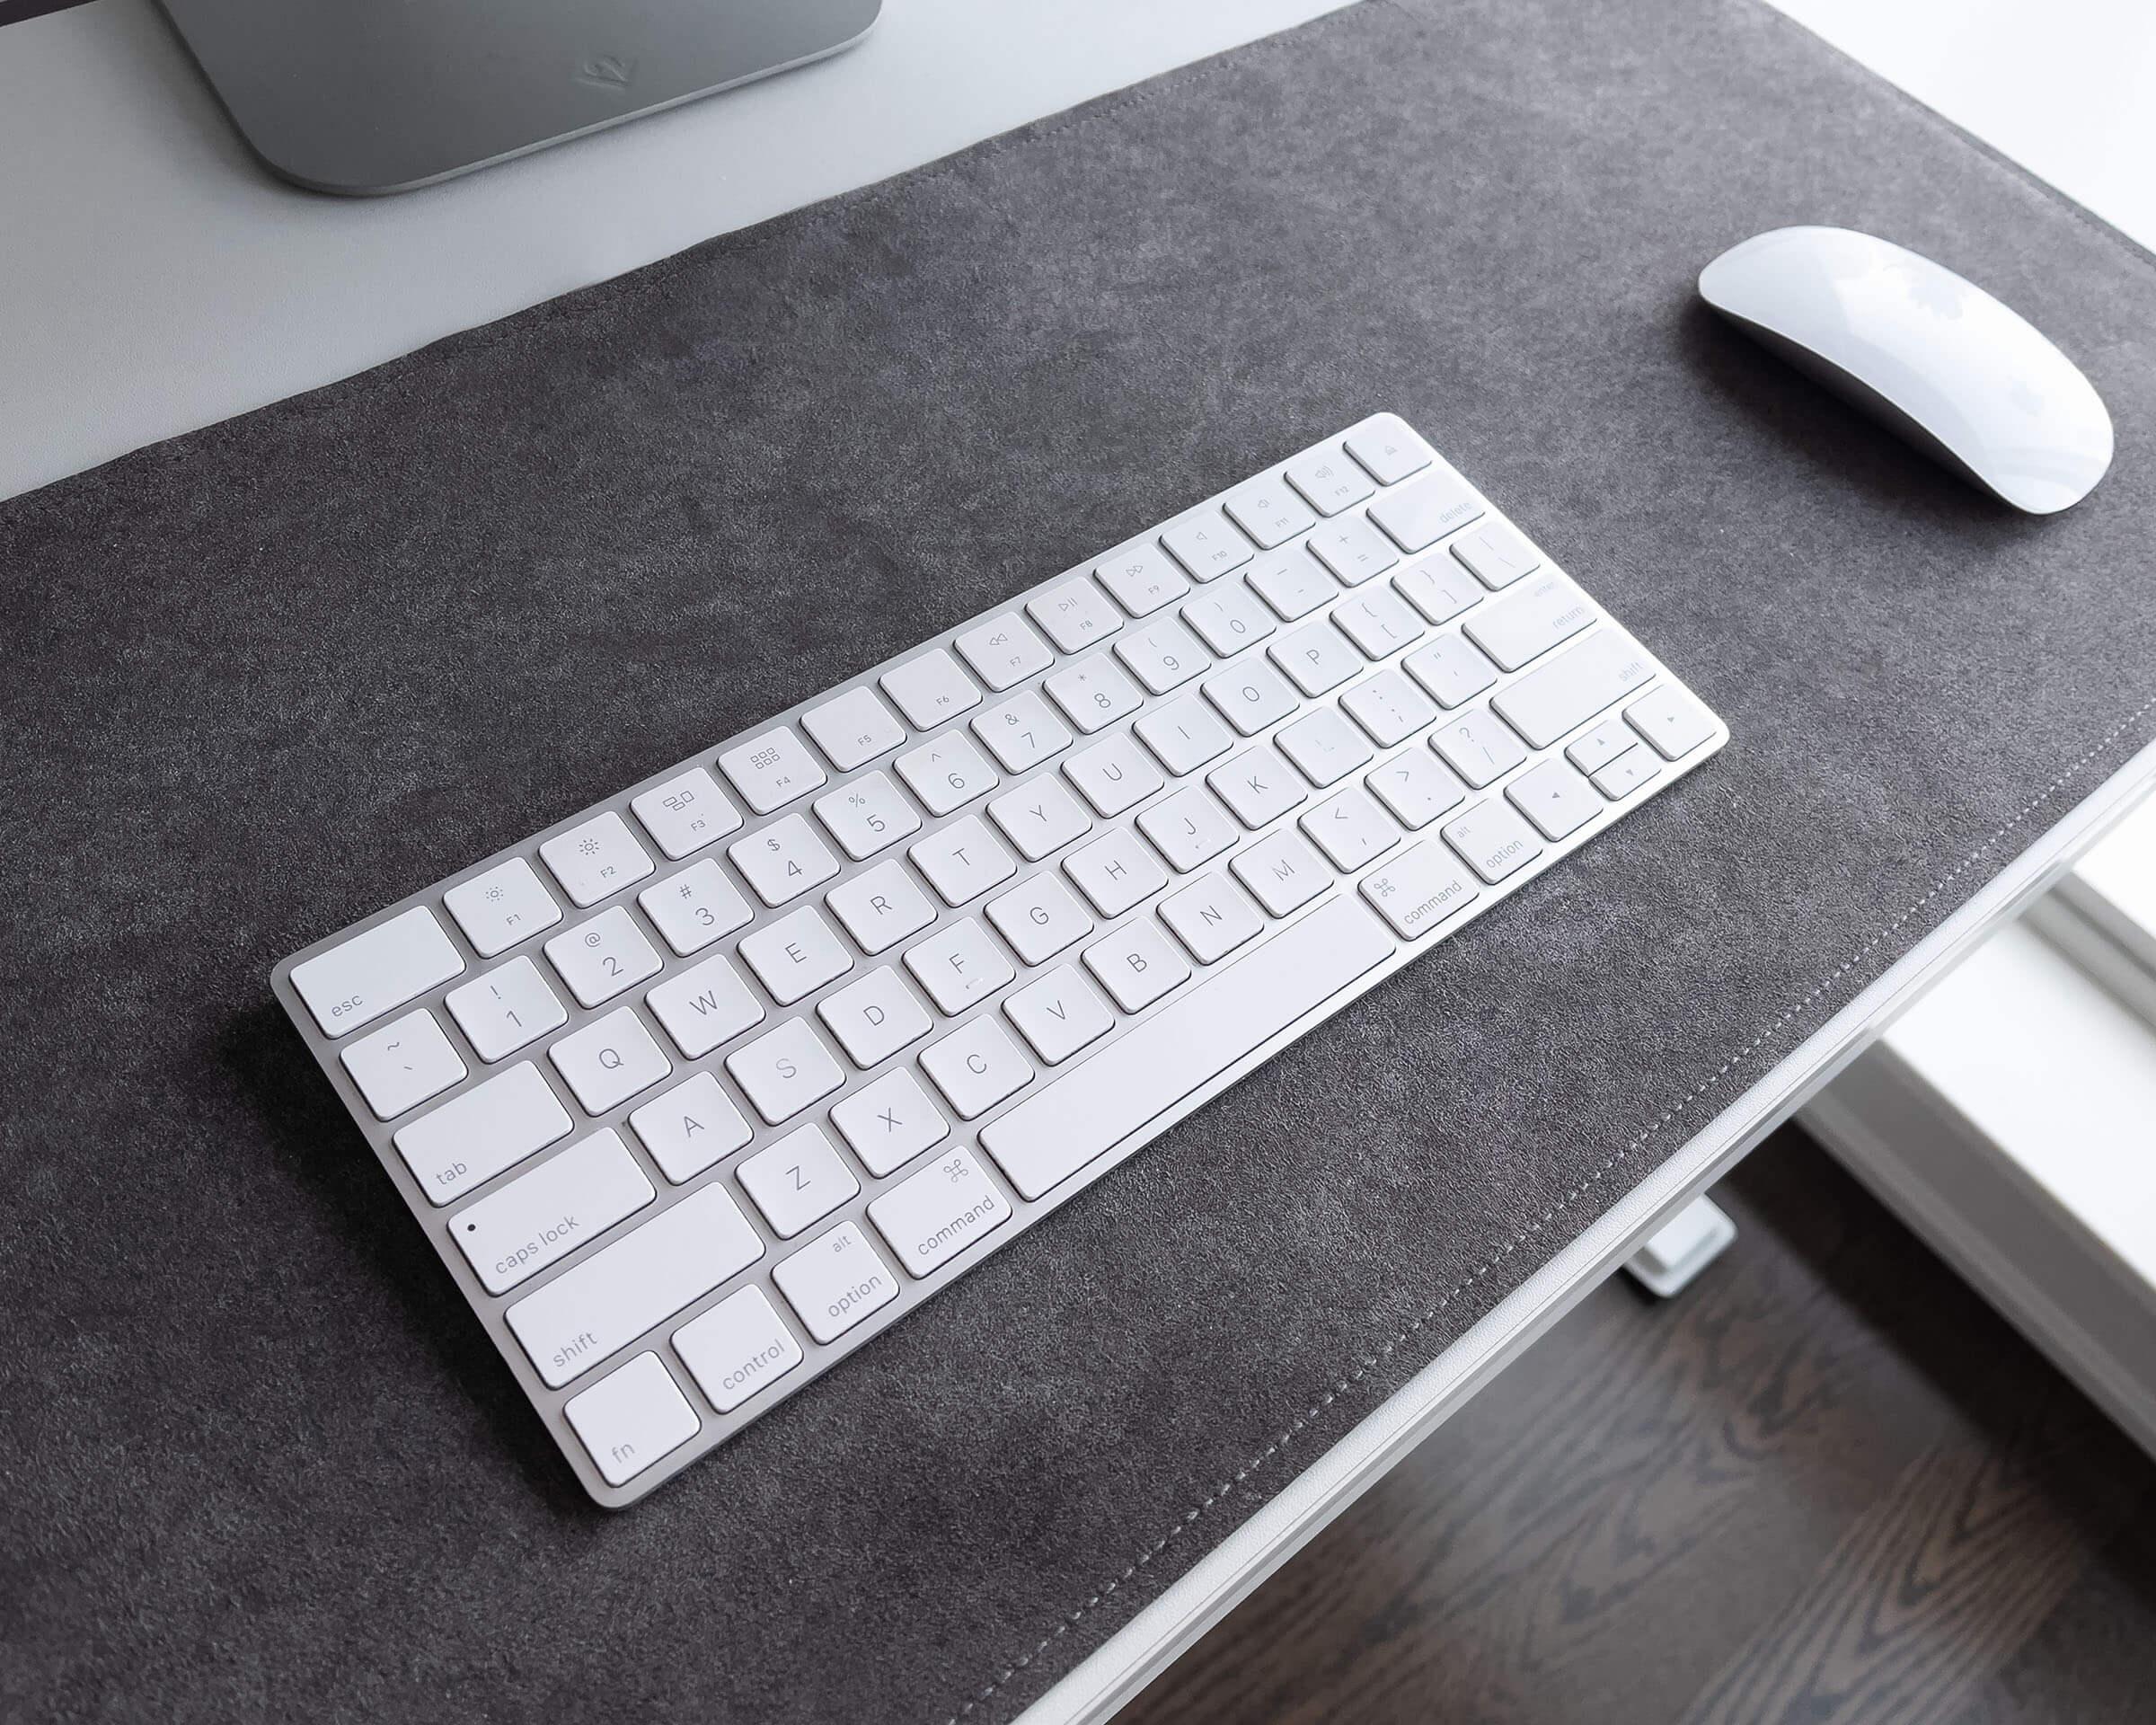 Microfiber Desk Mat - Soft Desk Cover